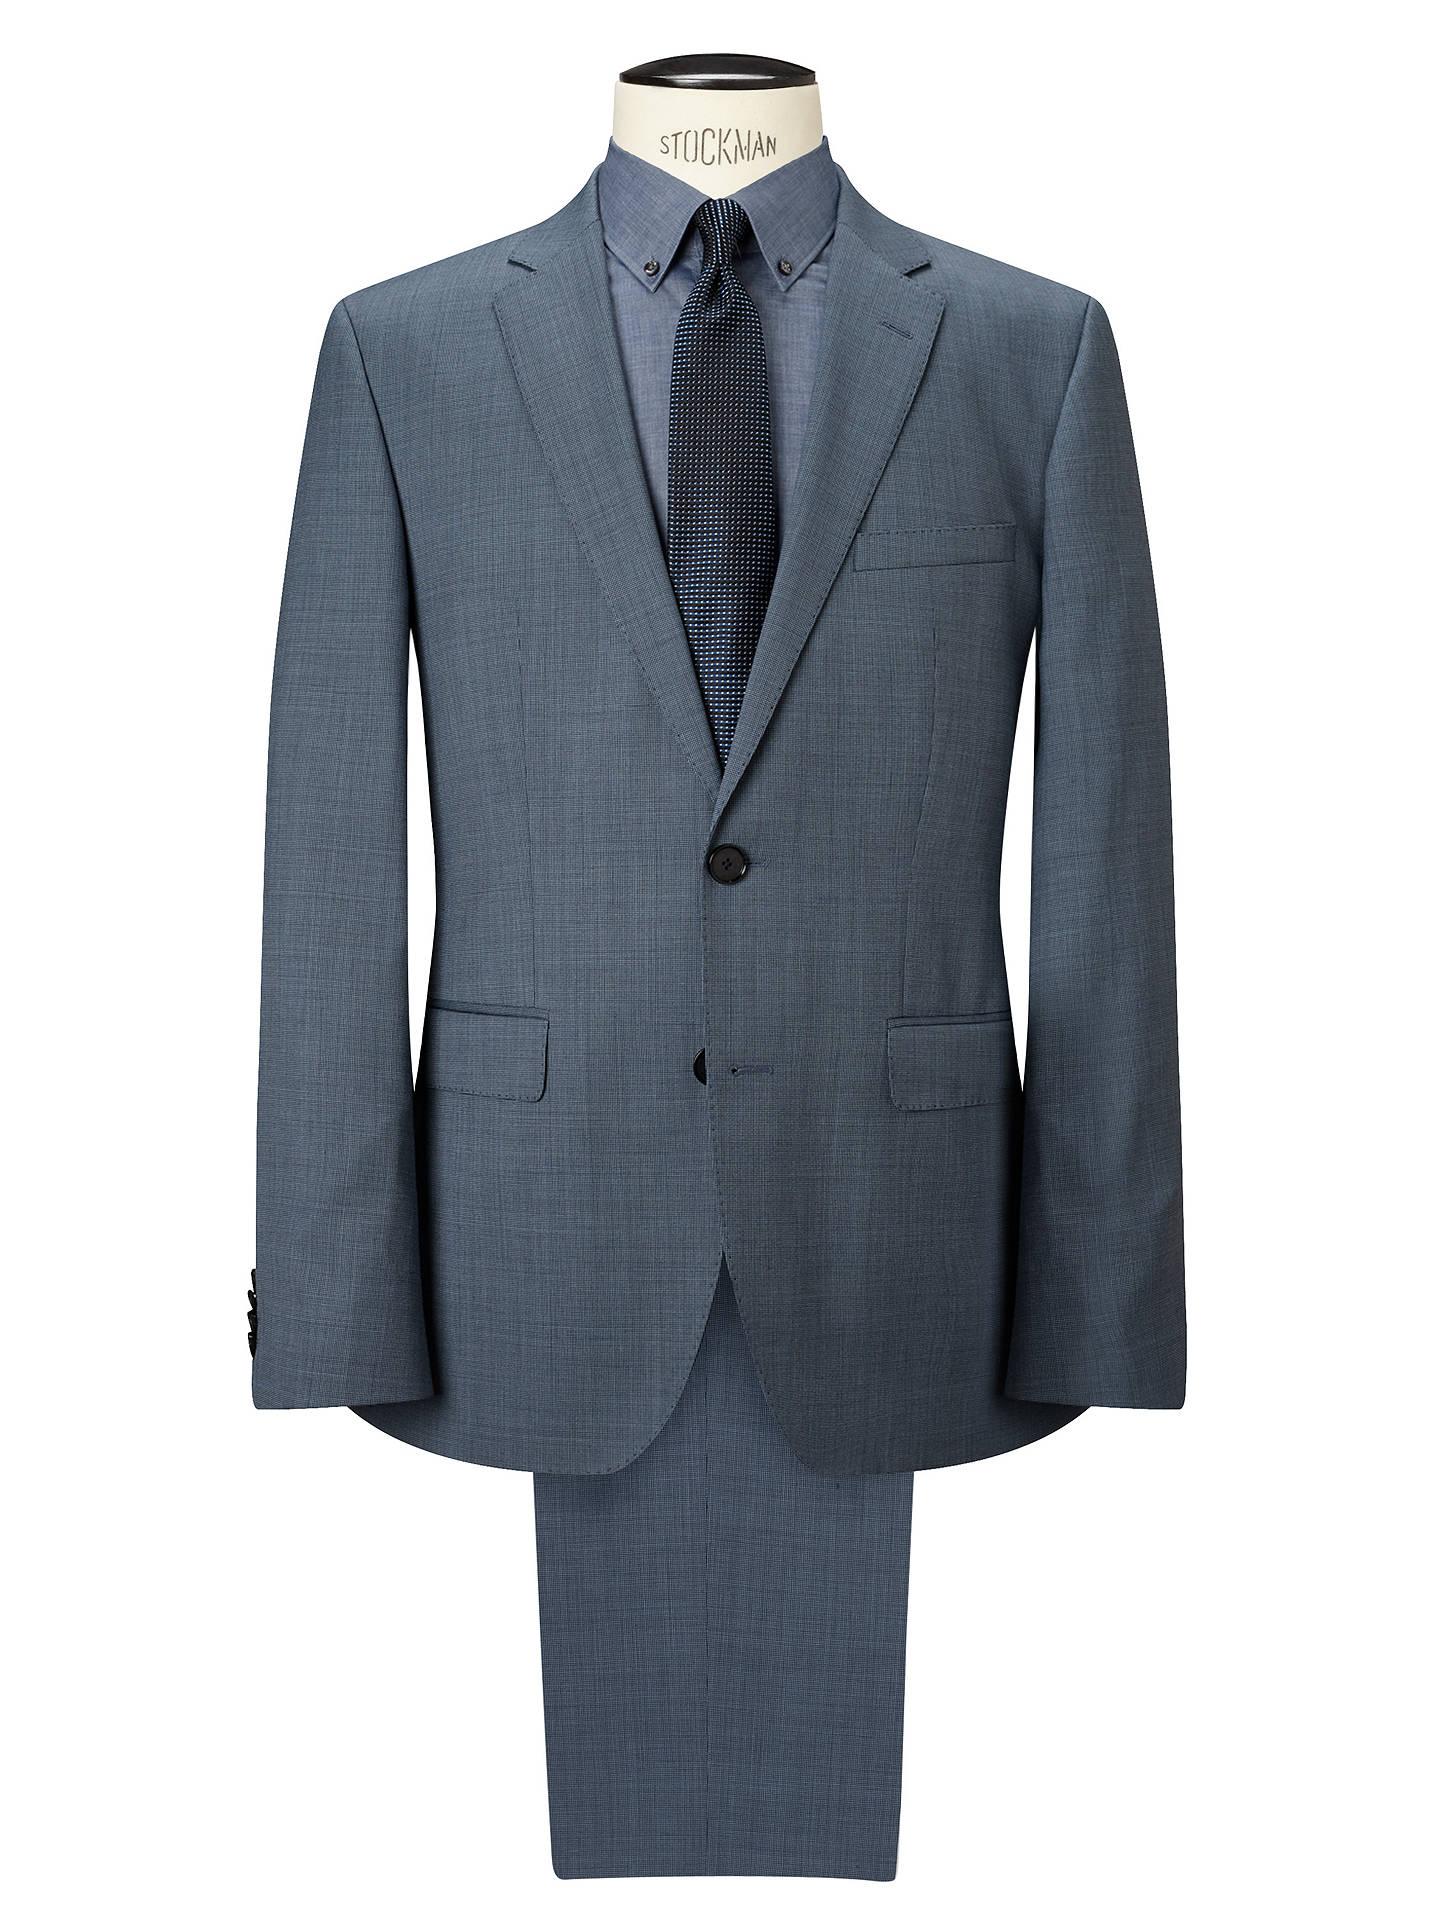 45a7d2091 HUGO by Hugo Boss C-Jeffrey/C-Simmons Check Wool Regular Fit Suit ...